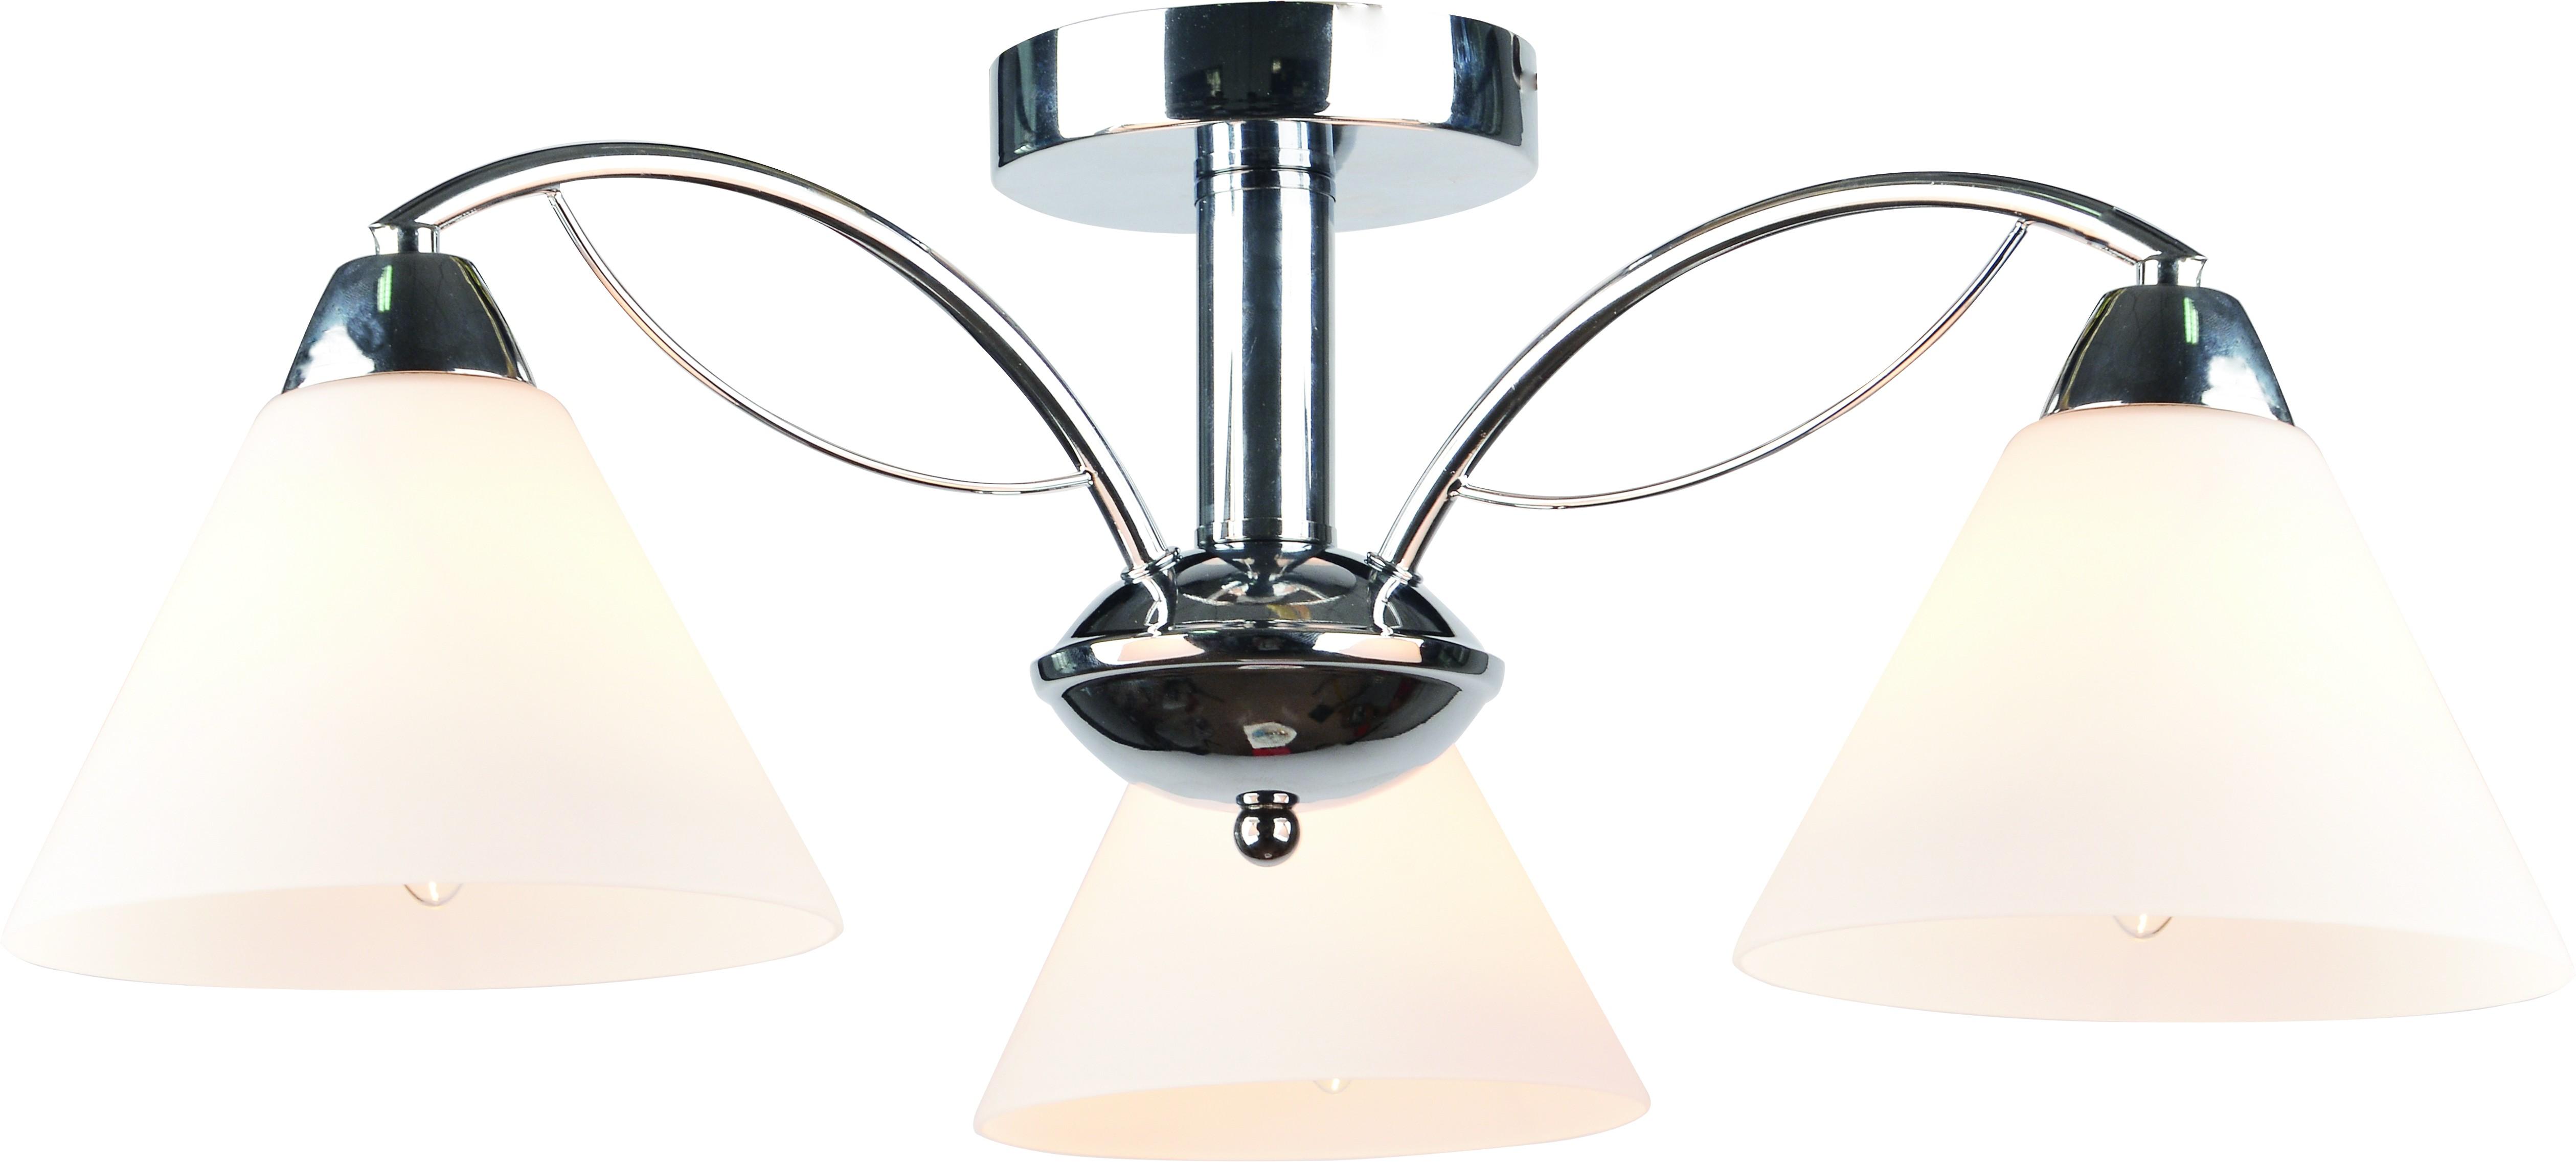 Люстра Arte lamp A1298pl-3cc люстра на штанге arte lamp federica a1298pl 3cc